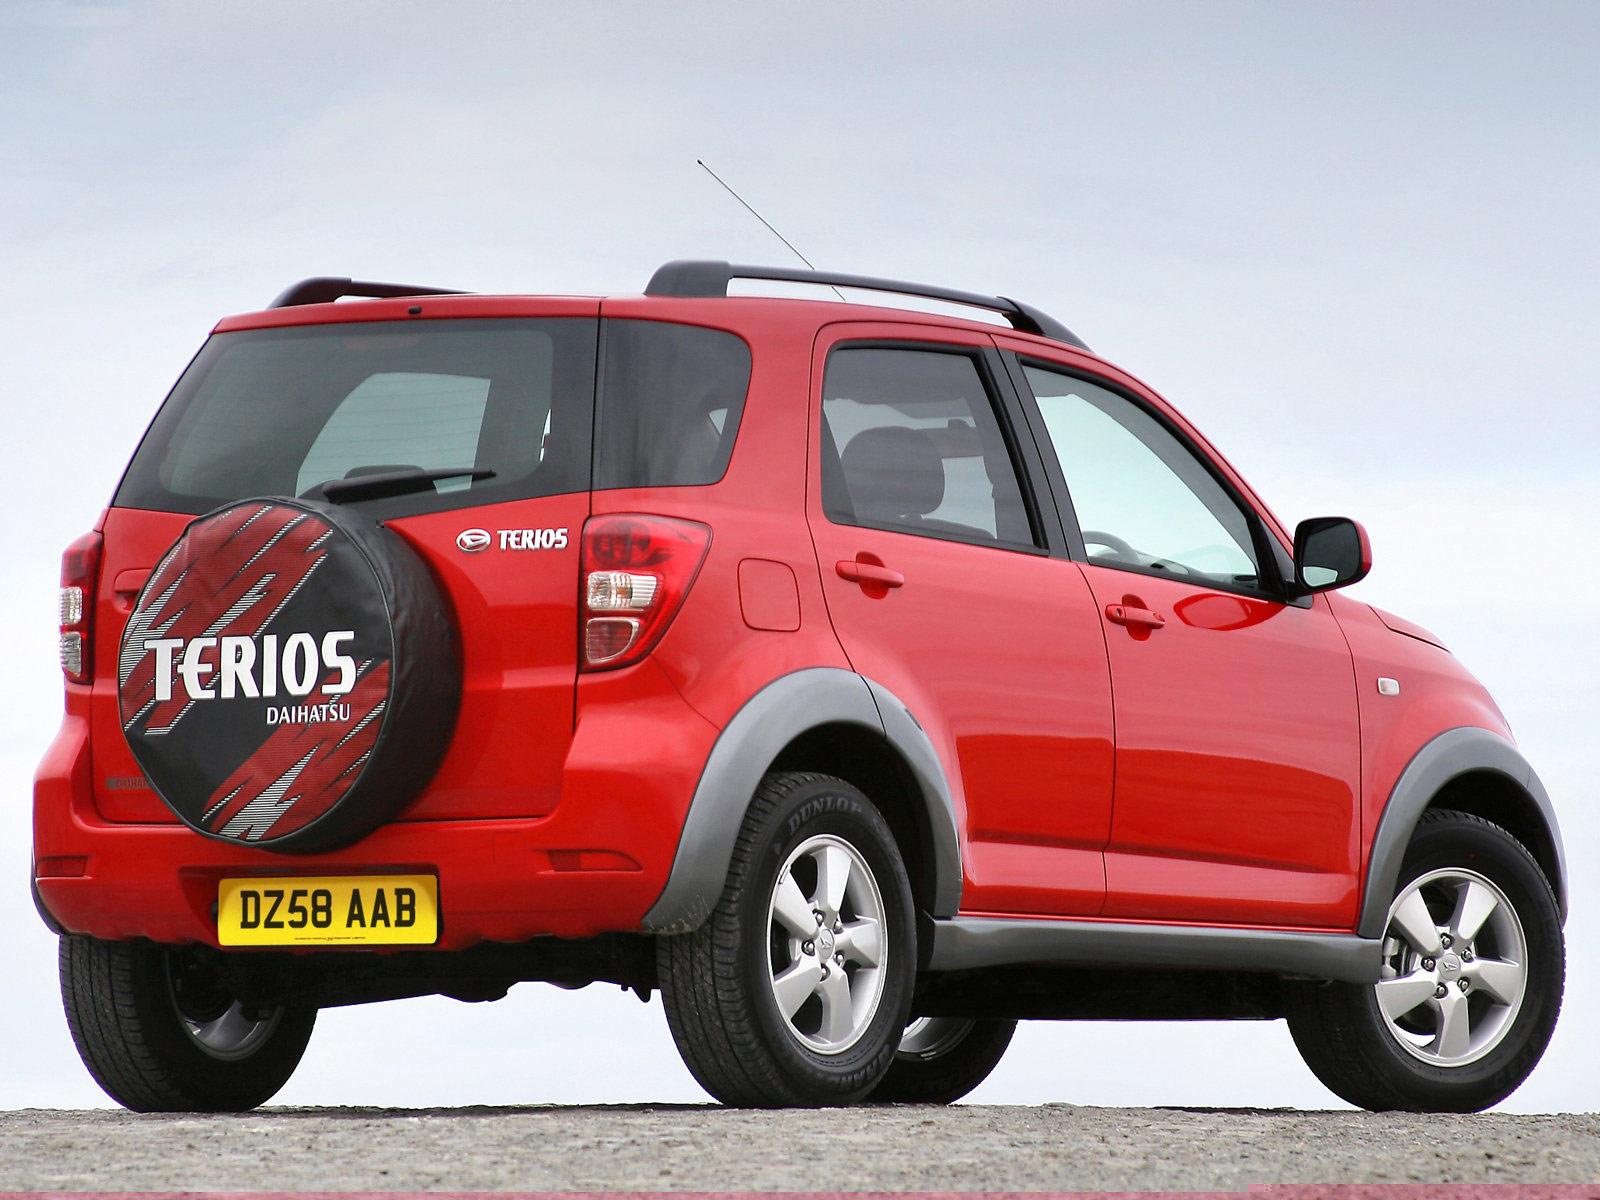 Cara Setting Alarm Grand New Avanza Toyota Yaris Trd 2013 Bekas Terios Mobil Petualang Dari Daihatsu Mobilku Org